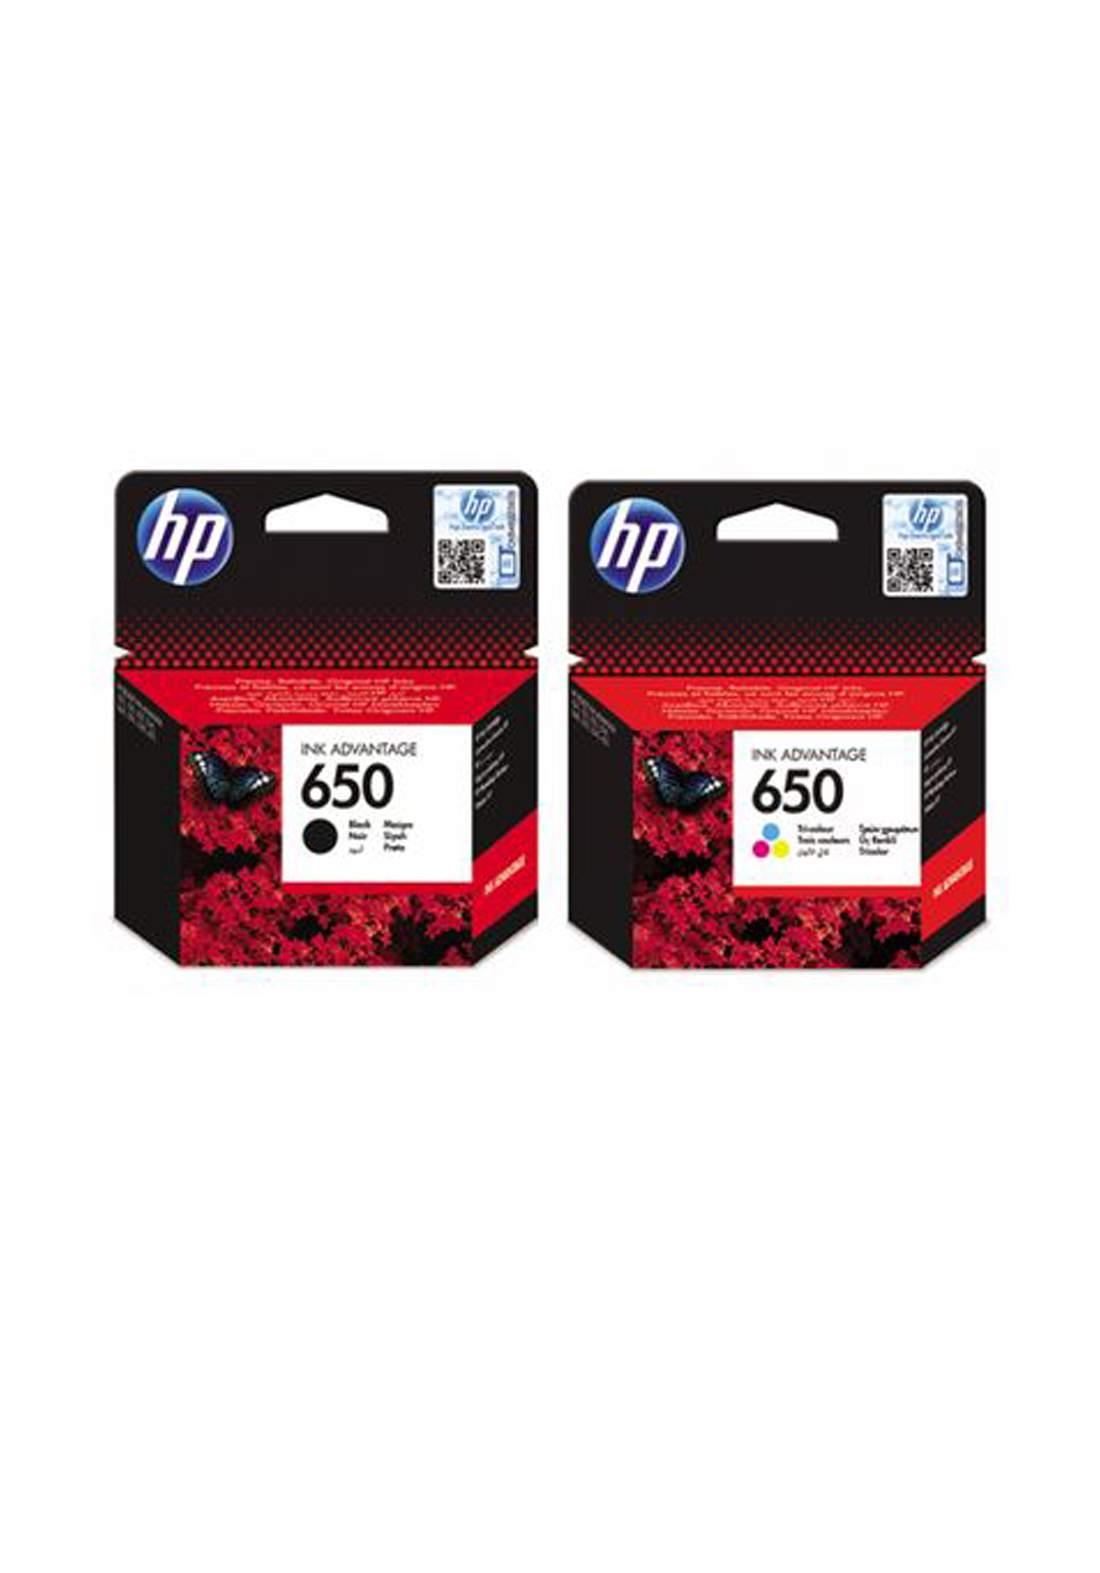 Hp 650 Ink Advantage Cartridge  Combo Pack مجموعة خراطيش حبر